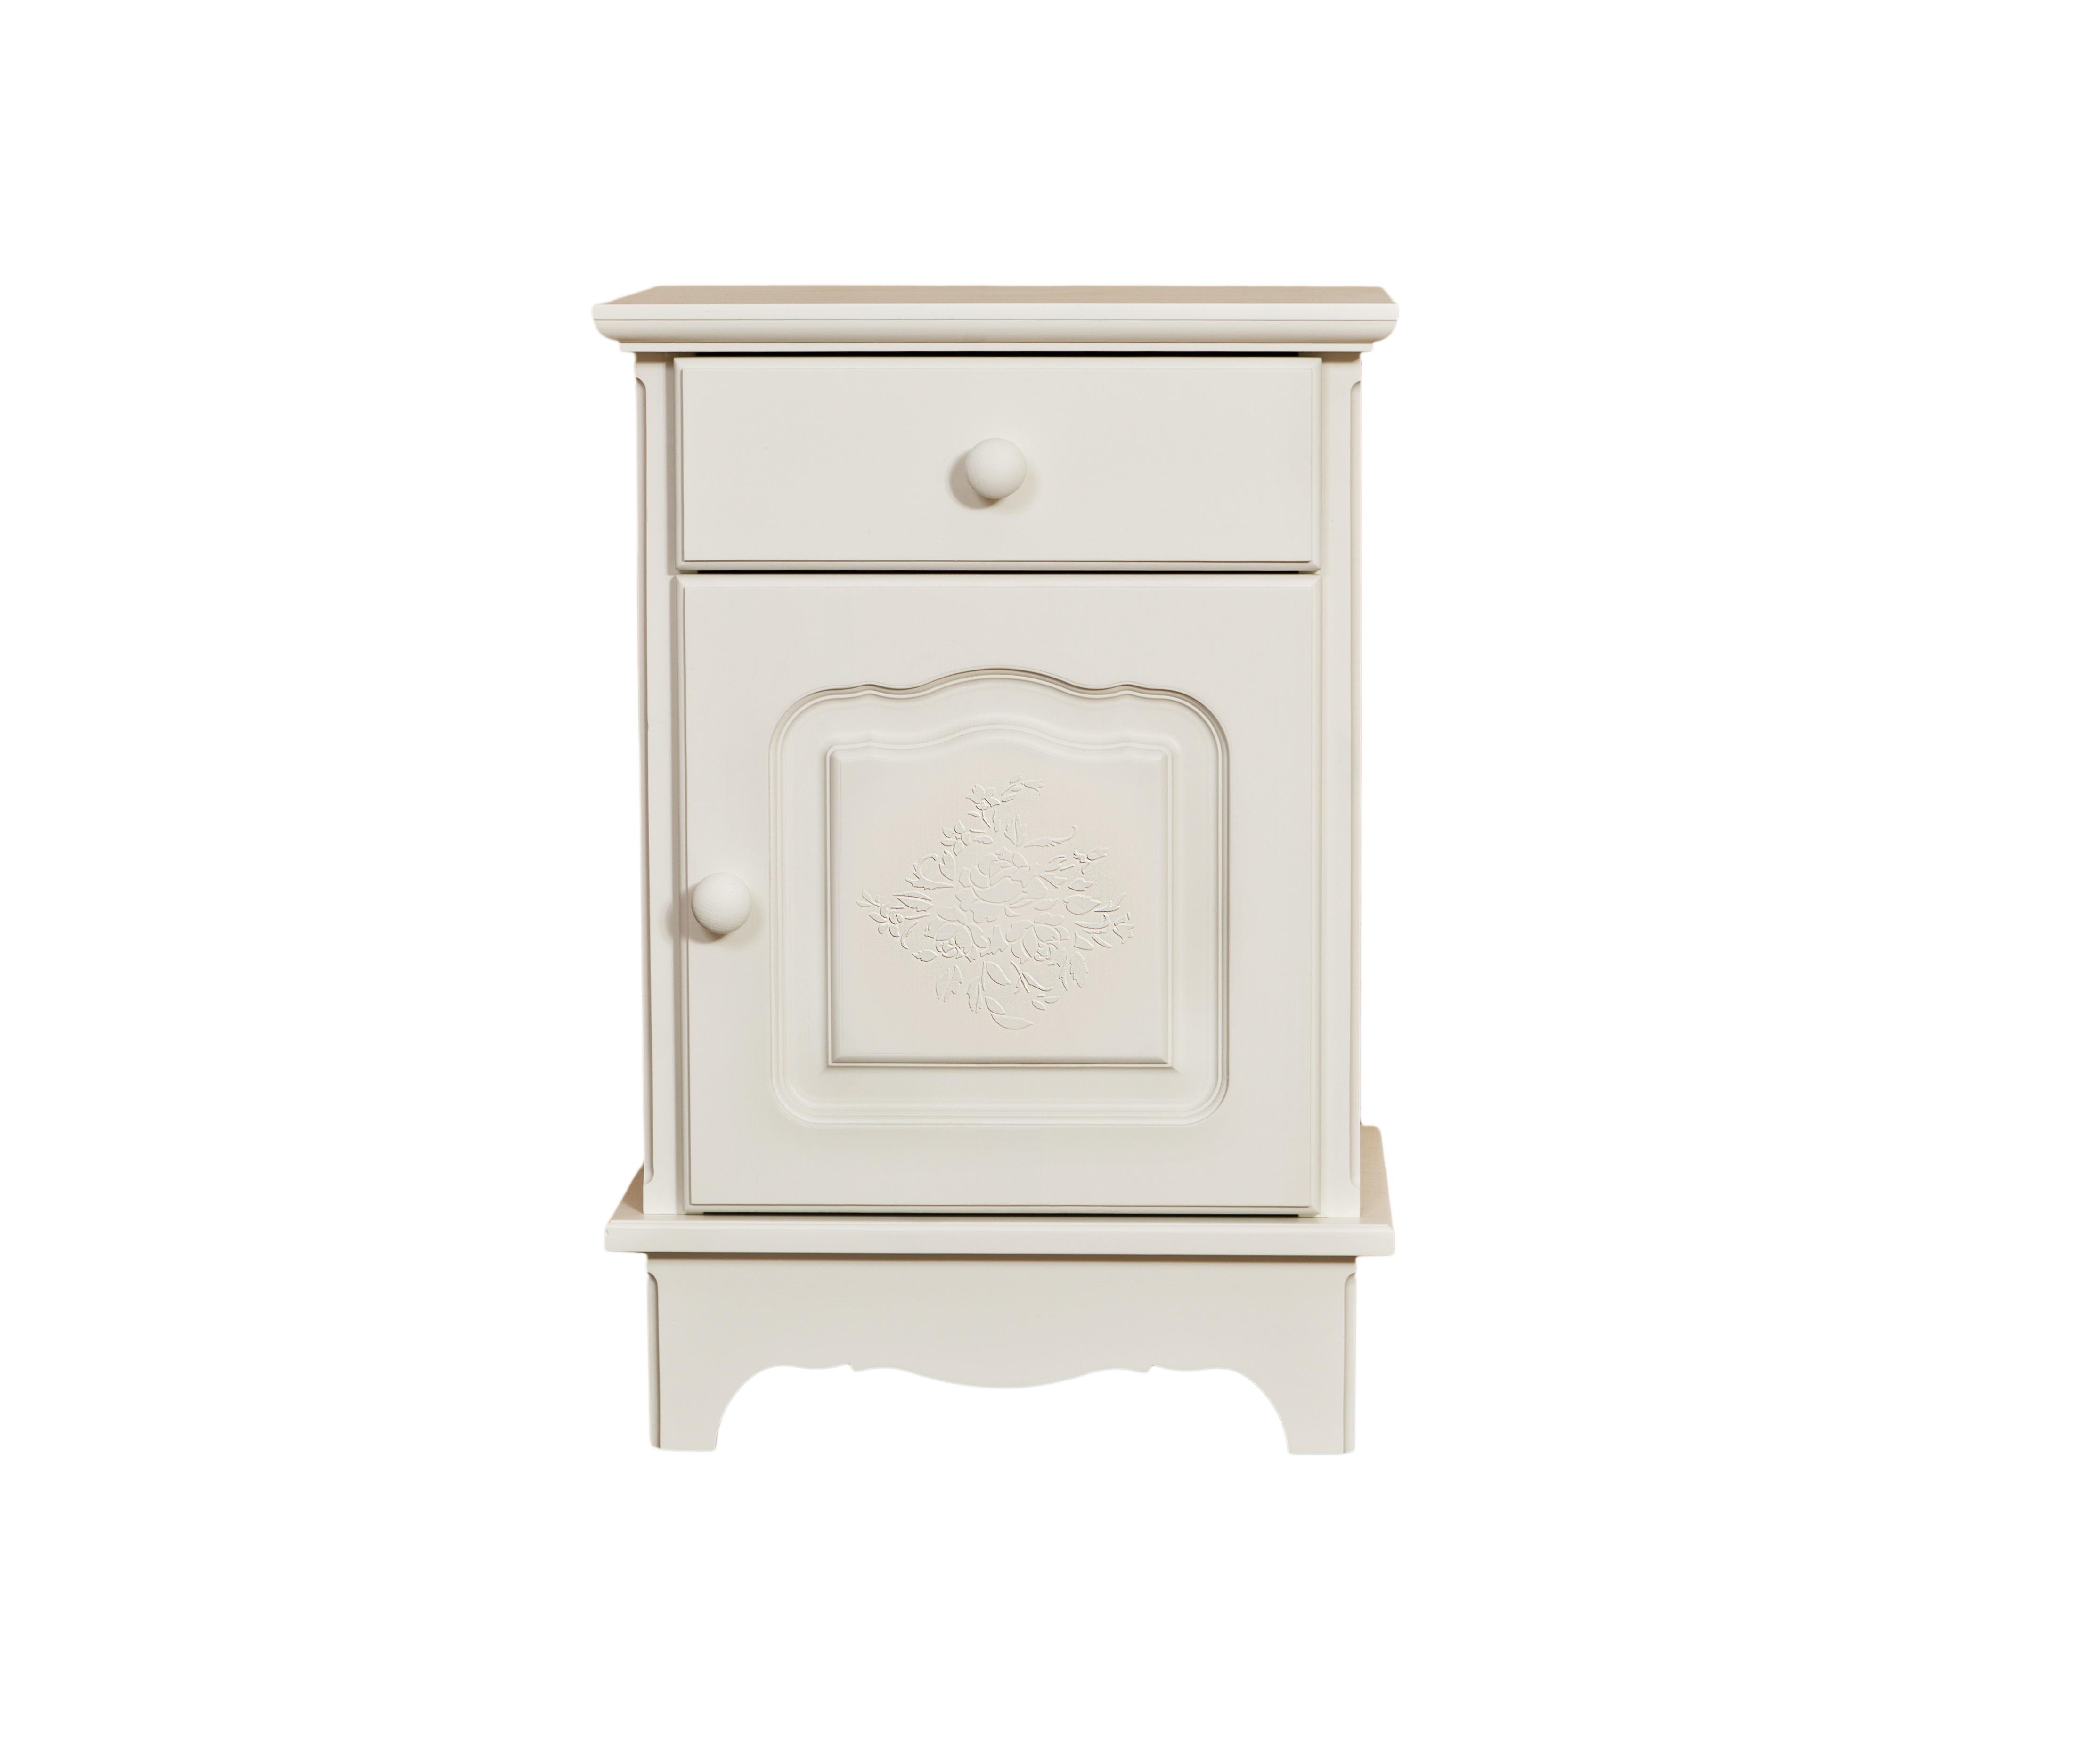 Тумбочка Belle Fleur BlancПрикроватные тумбы<br>Отделка: Belle Fleur Blanc - объемный орнамент из роз белого цвета.&amp;amp;nbsp;<br><br>Material: Береза<br>Width см: 45<br>Depth см: 32,5<br>Height см: 65